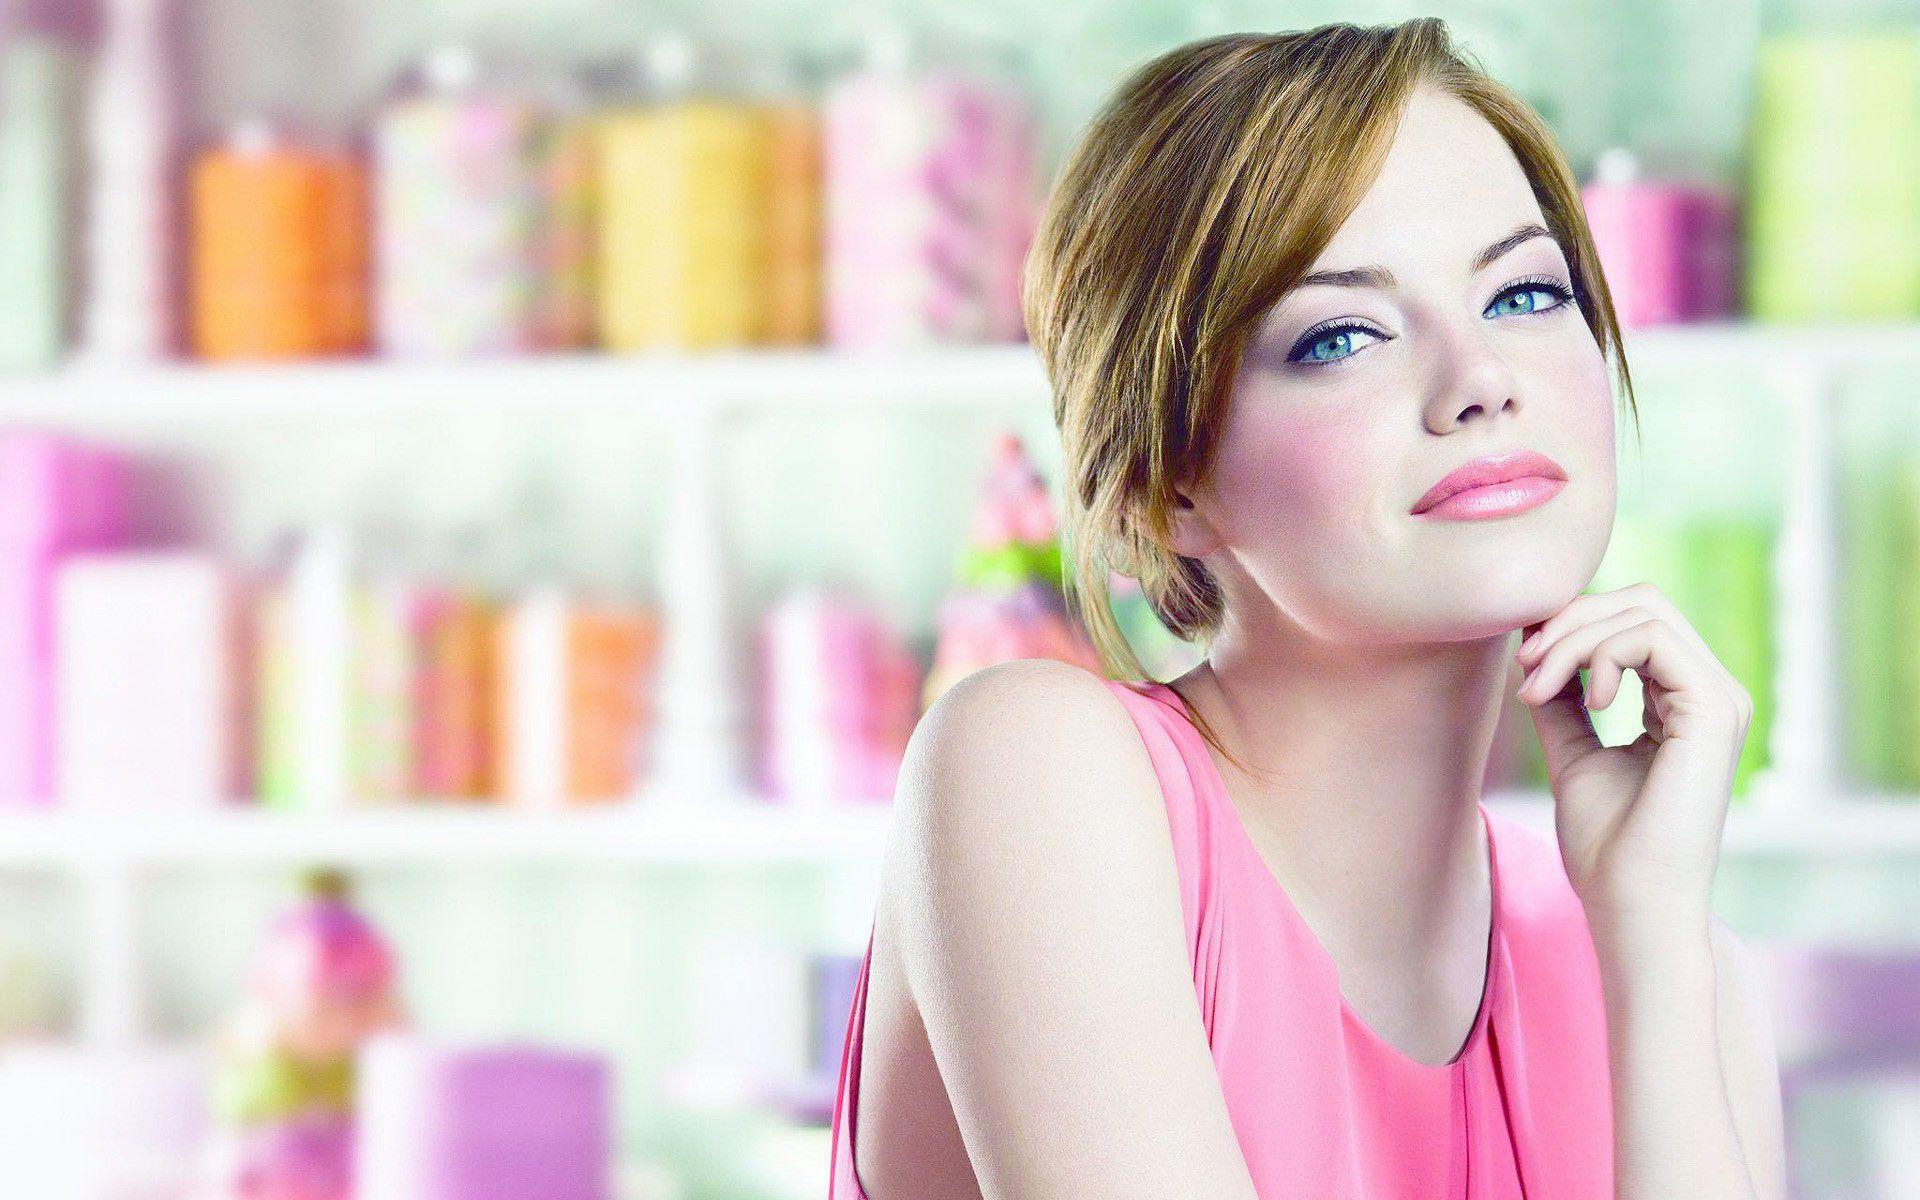 Emma Stone Hd Wallpaper - WallpaperSafari